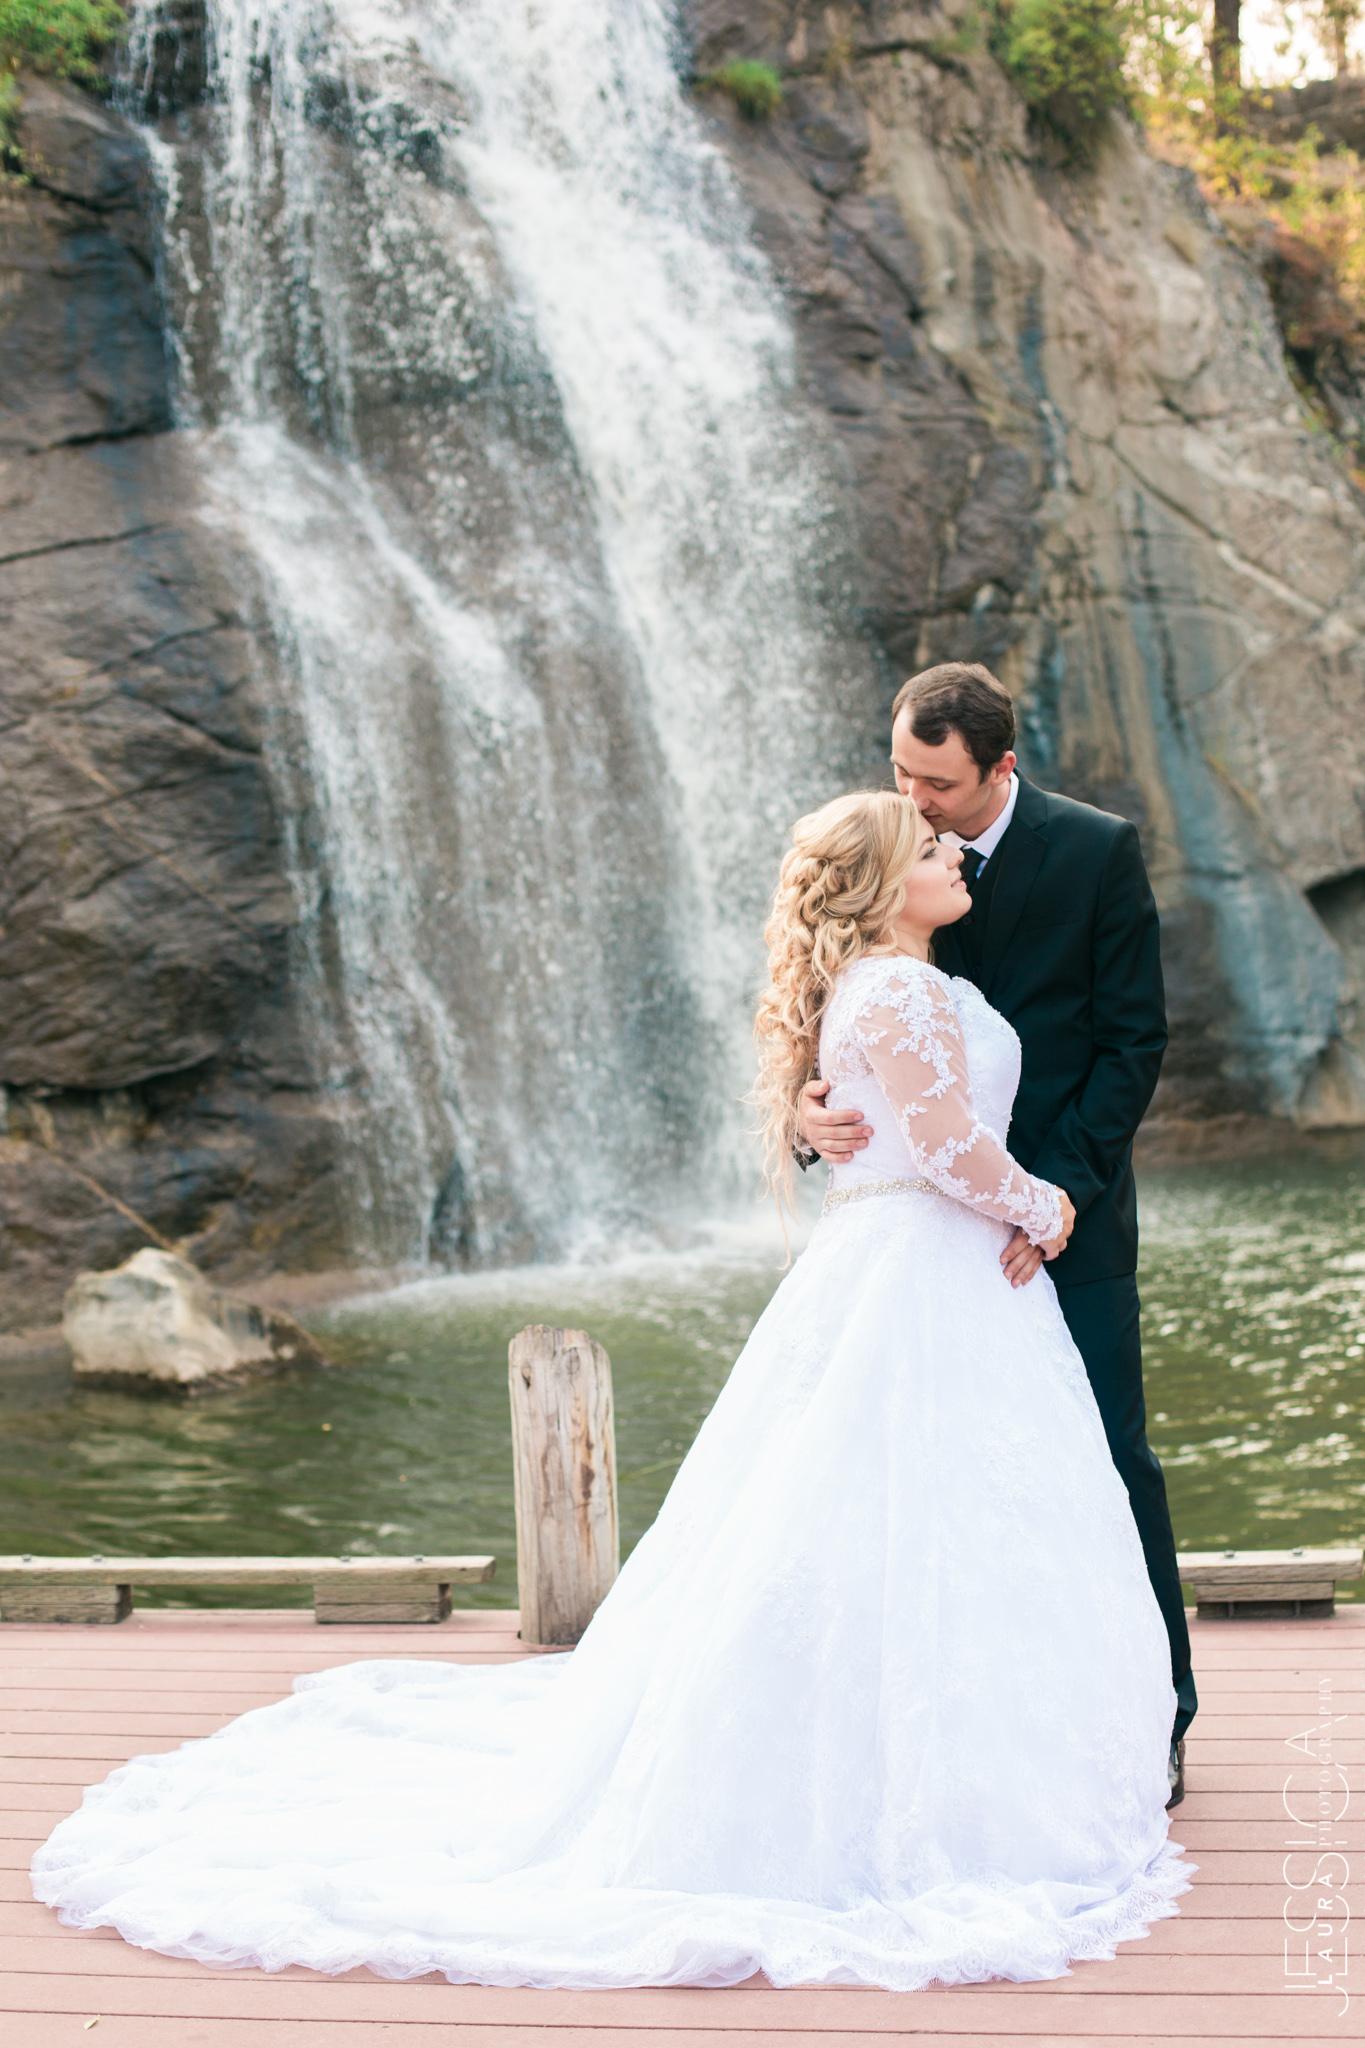 Eugene-Maryana_wedding_08062017_web (537 of 558).JPG